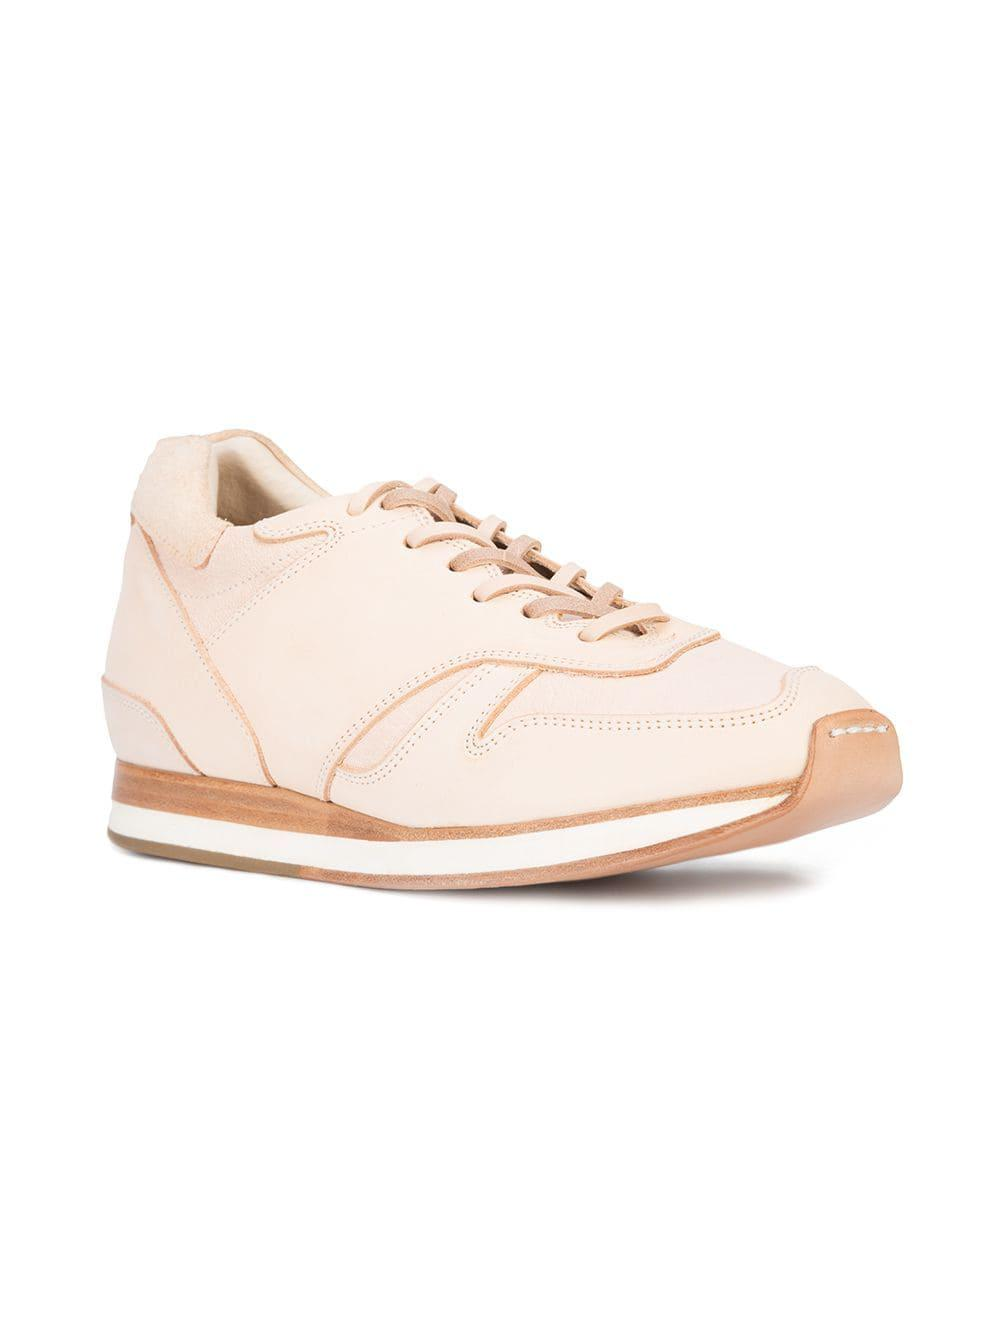 49747257b Lyst - Hender Scheme Mip-08 Sneakers in Pink for Men